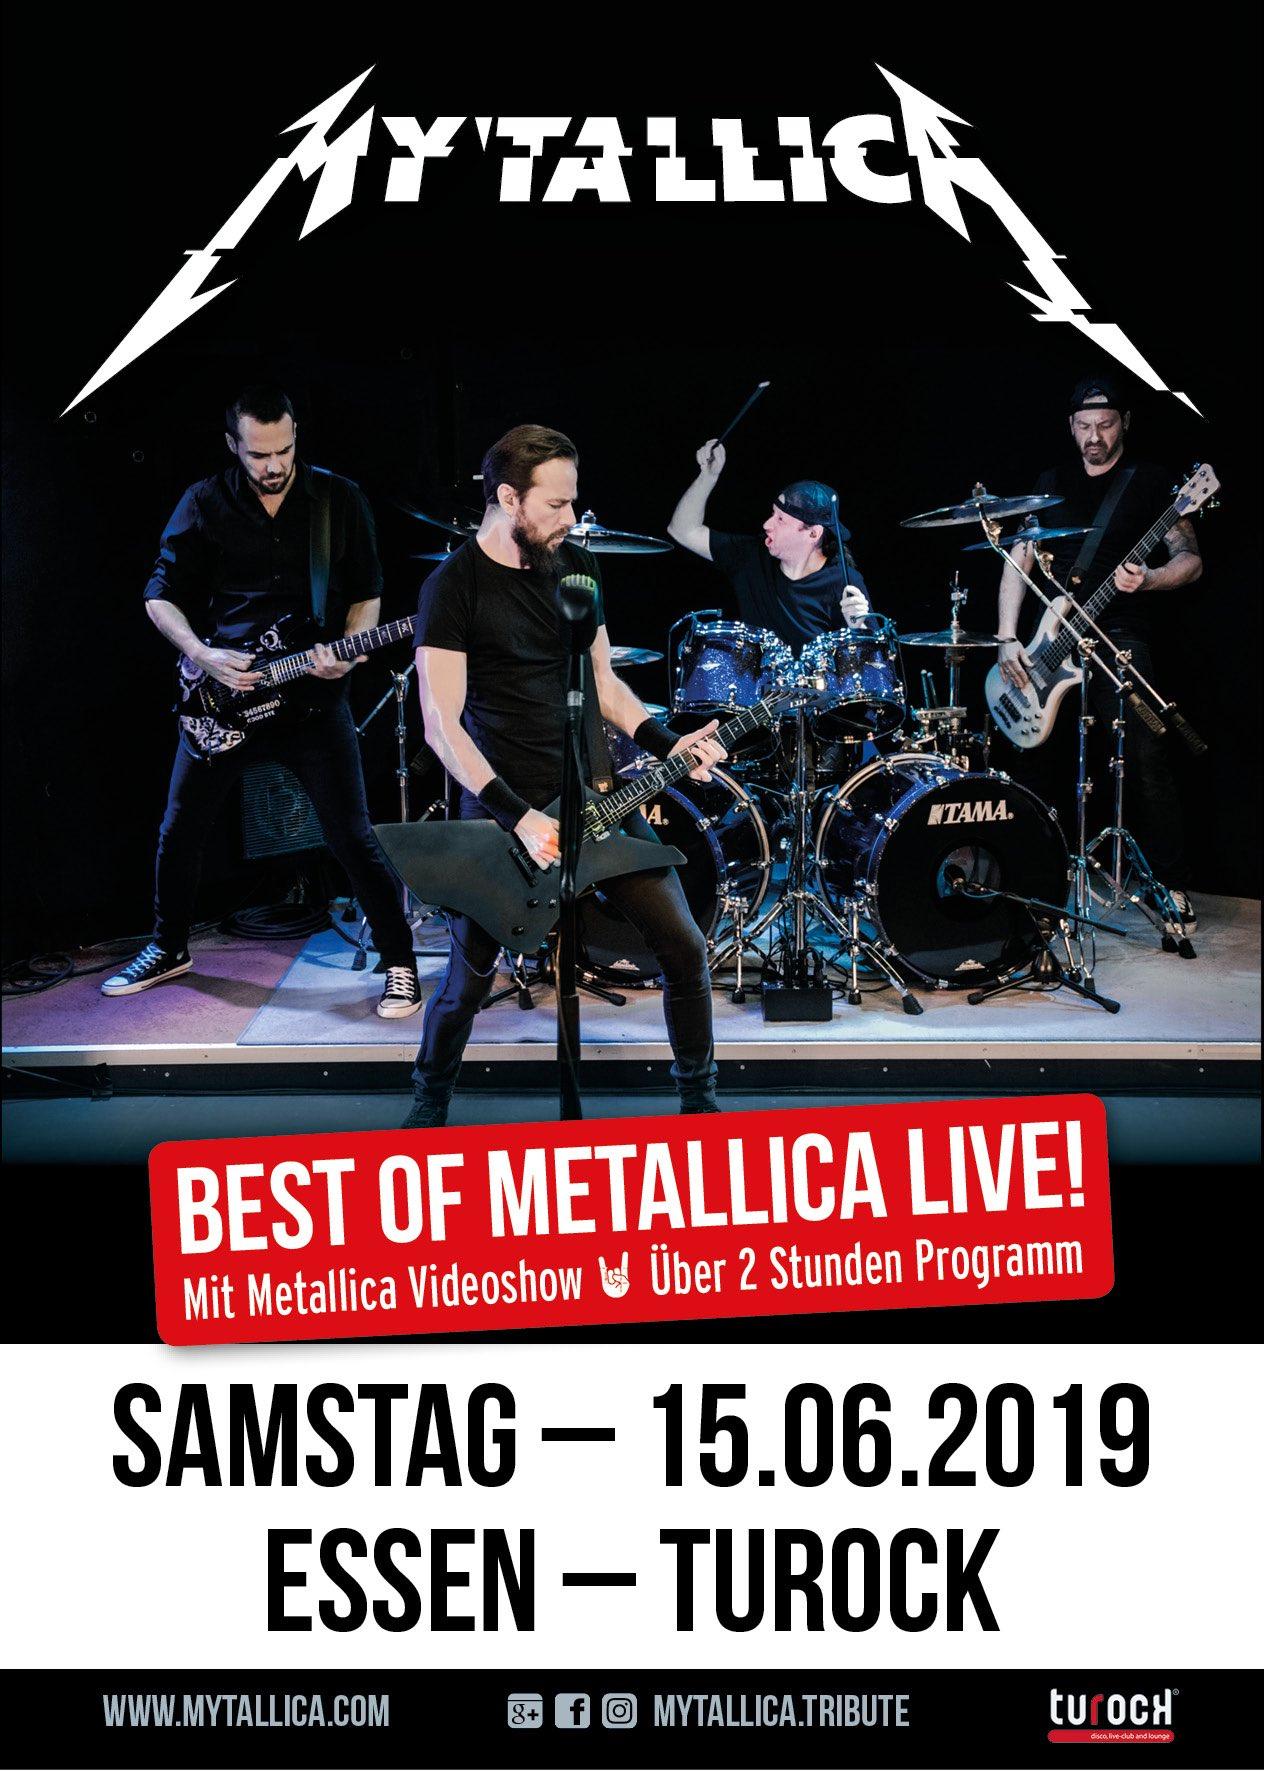 metallica-coverband-mytallica-essen-turock-2019-tickets-live